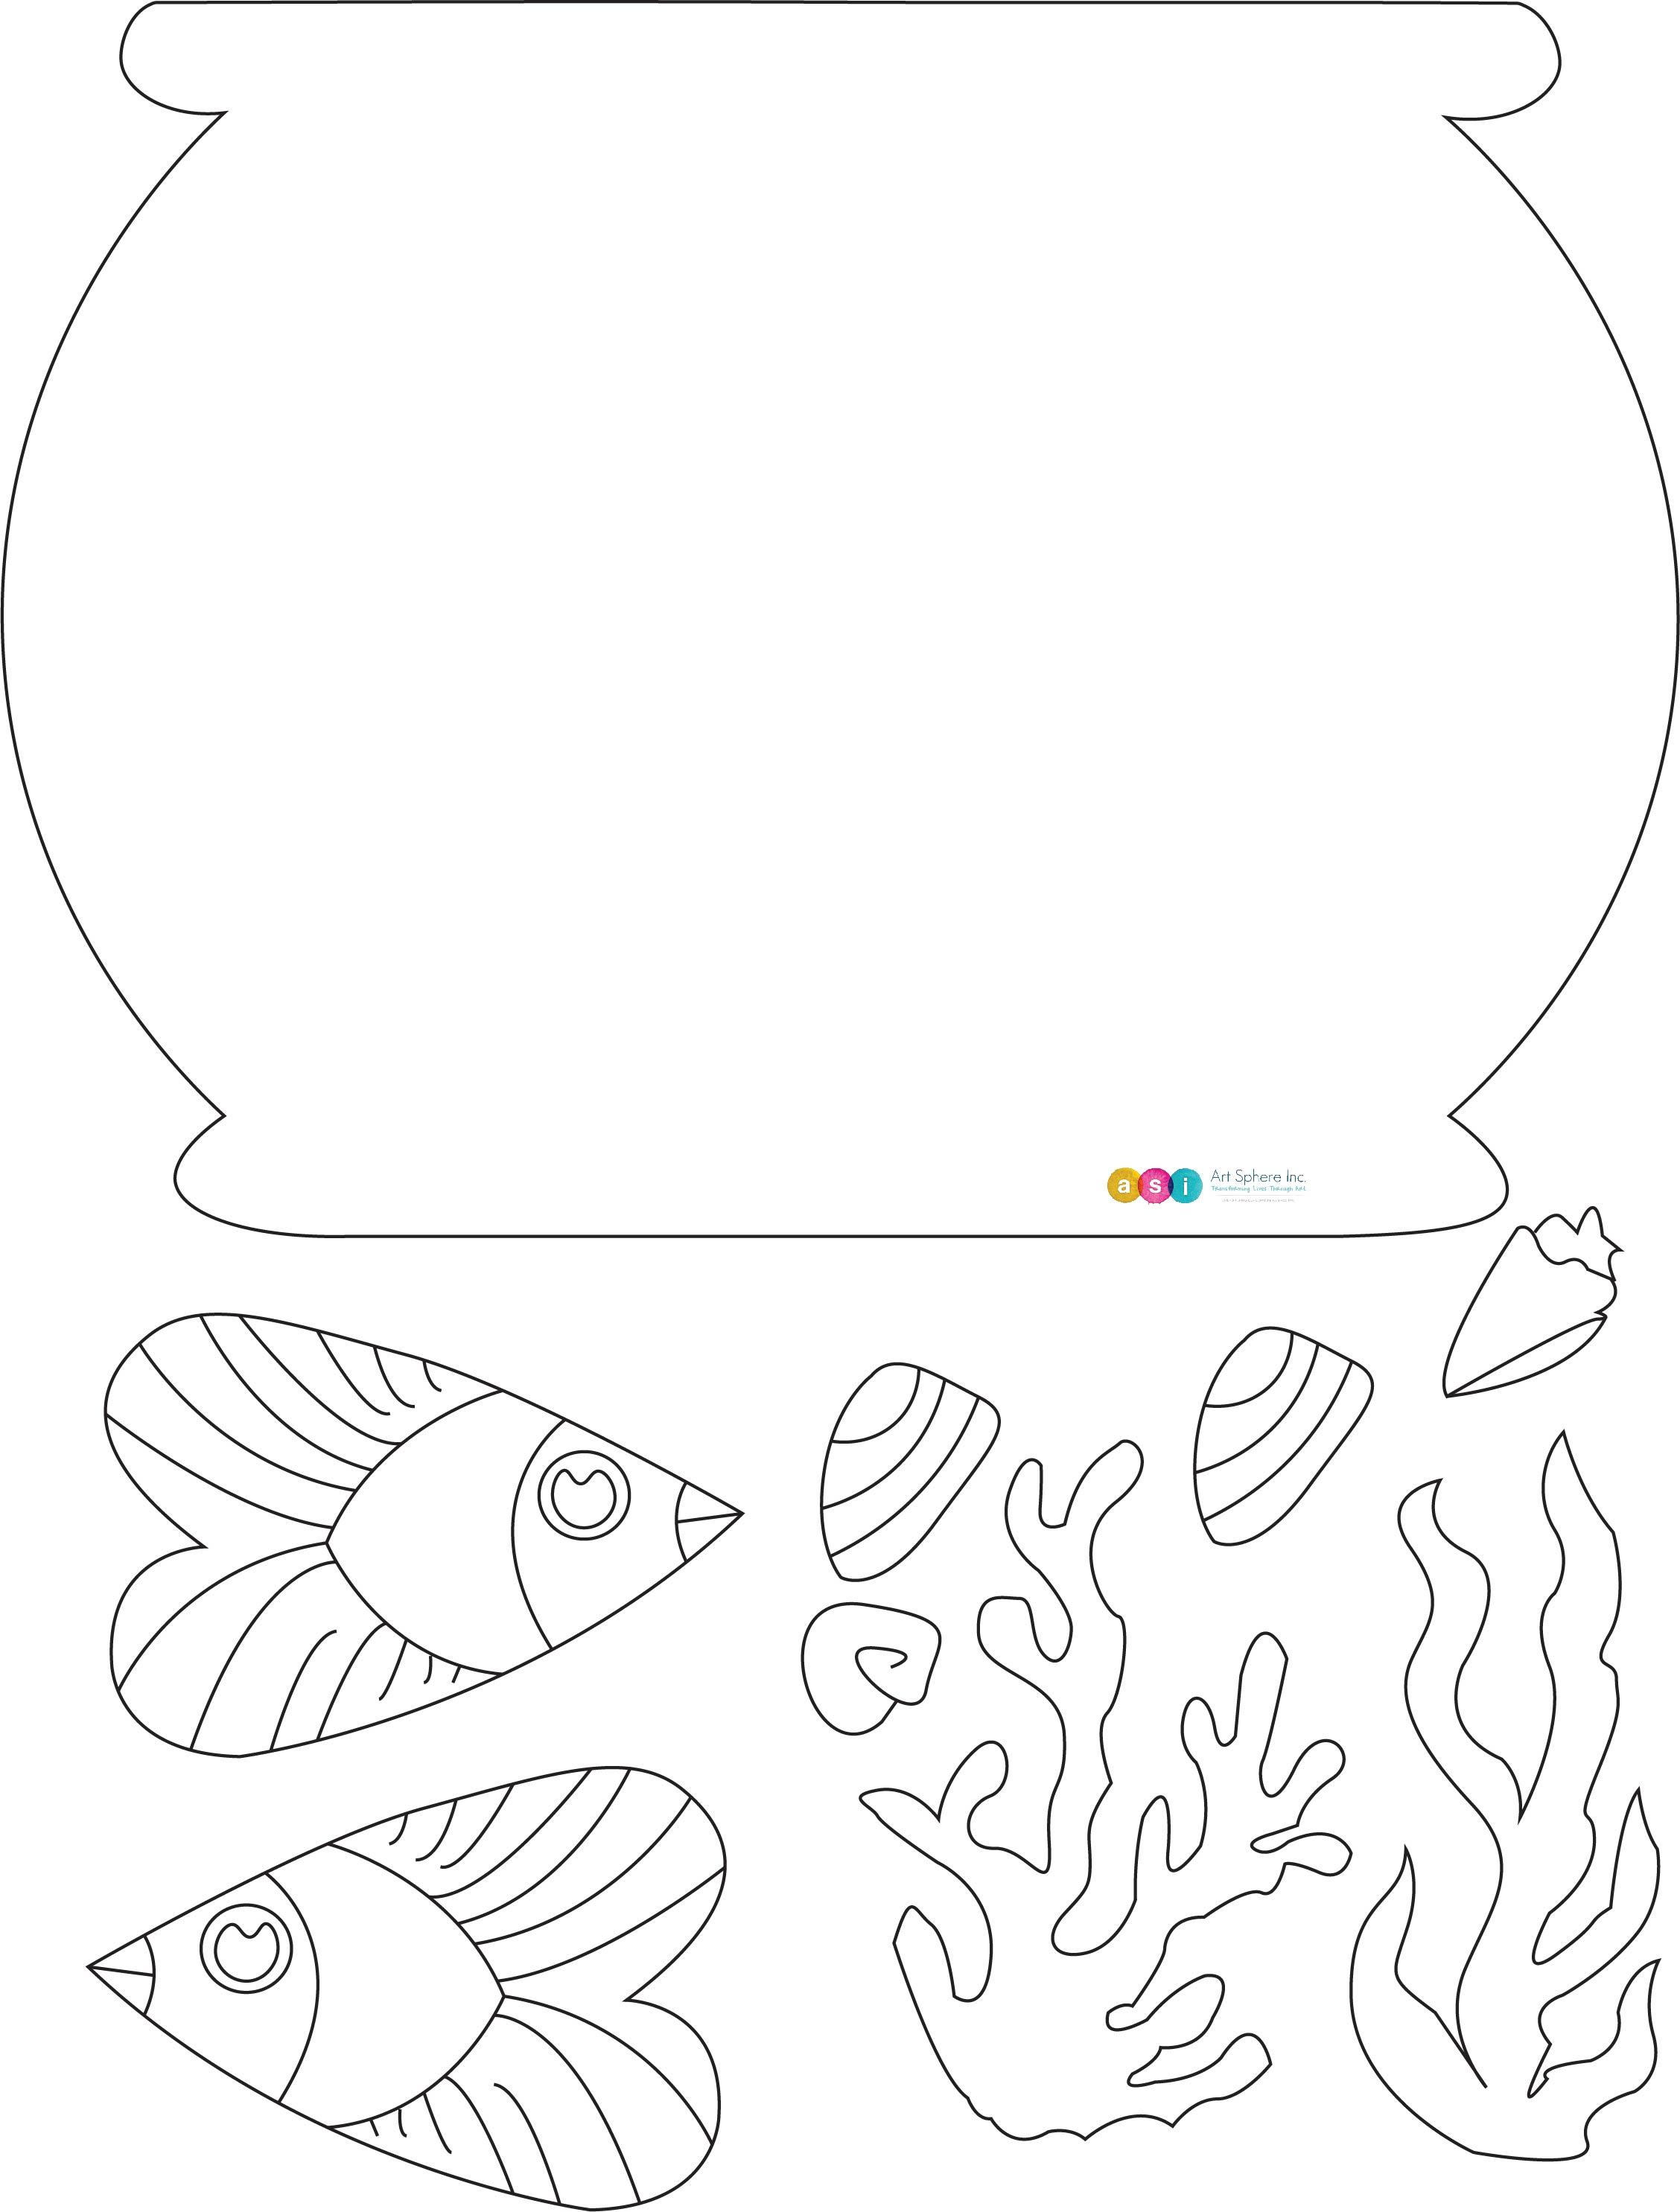 Fishbowl Handout